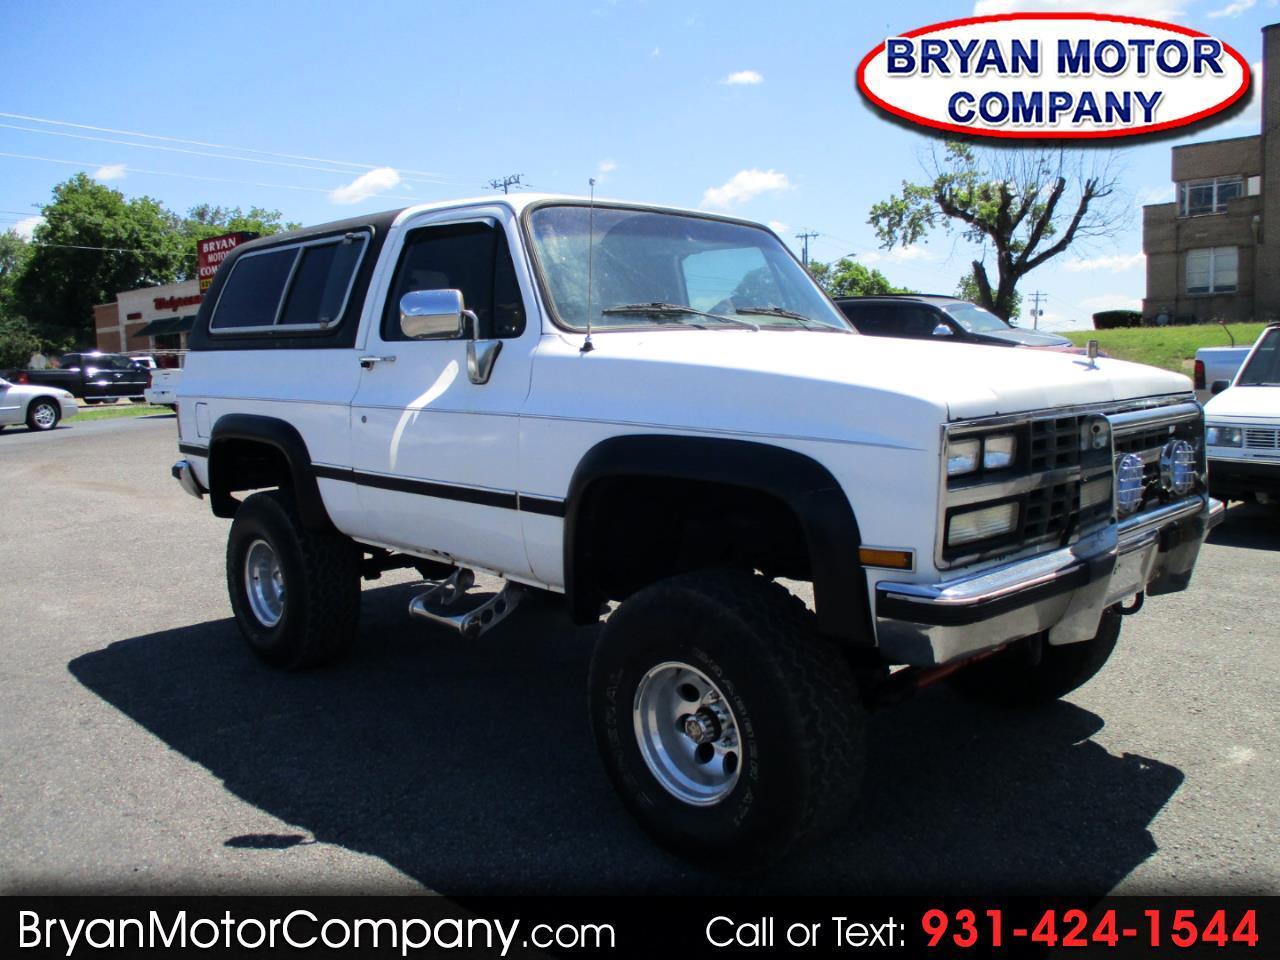 1989 Chevrolet Blazer 4WD